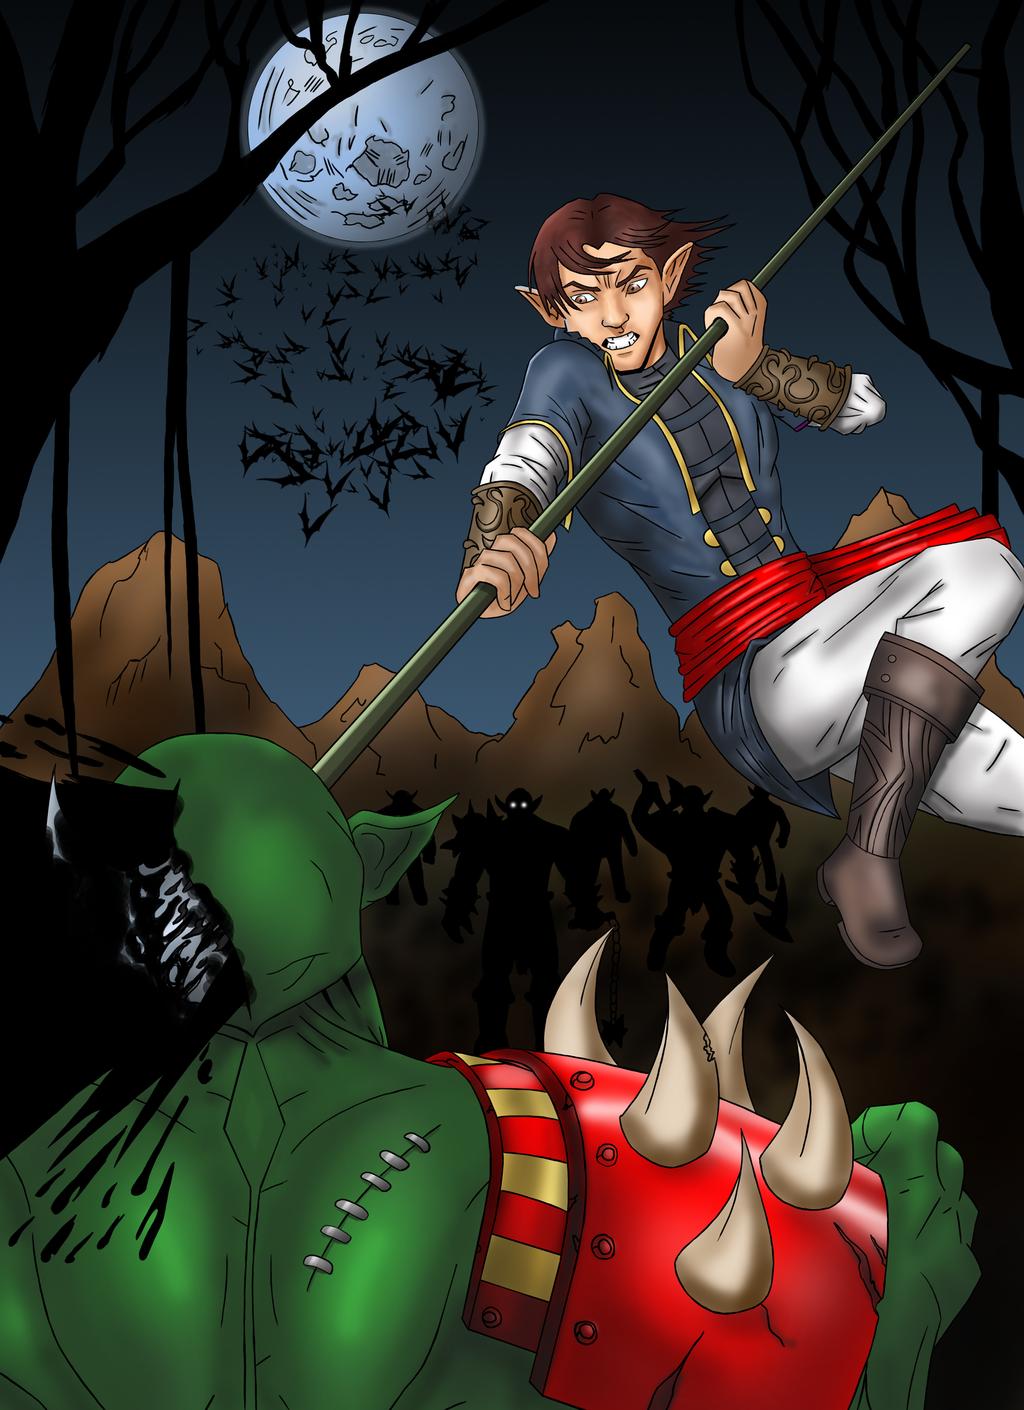 Azz vs orcs by Th3DarkKn1ght